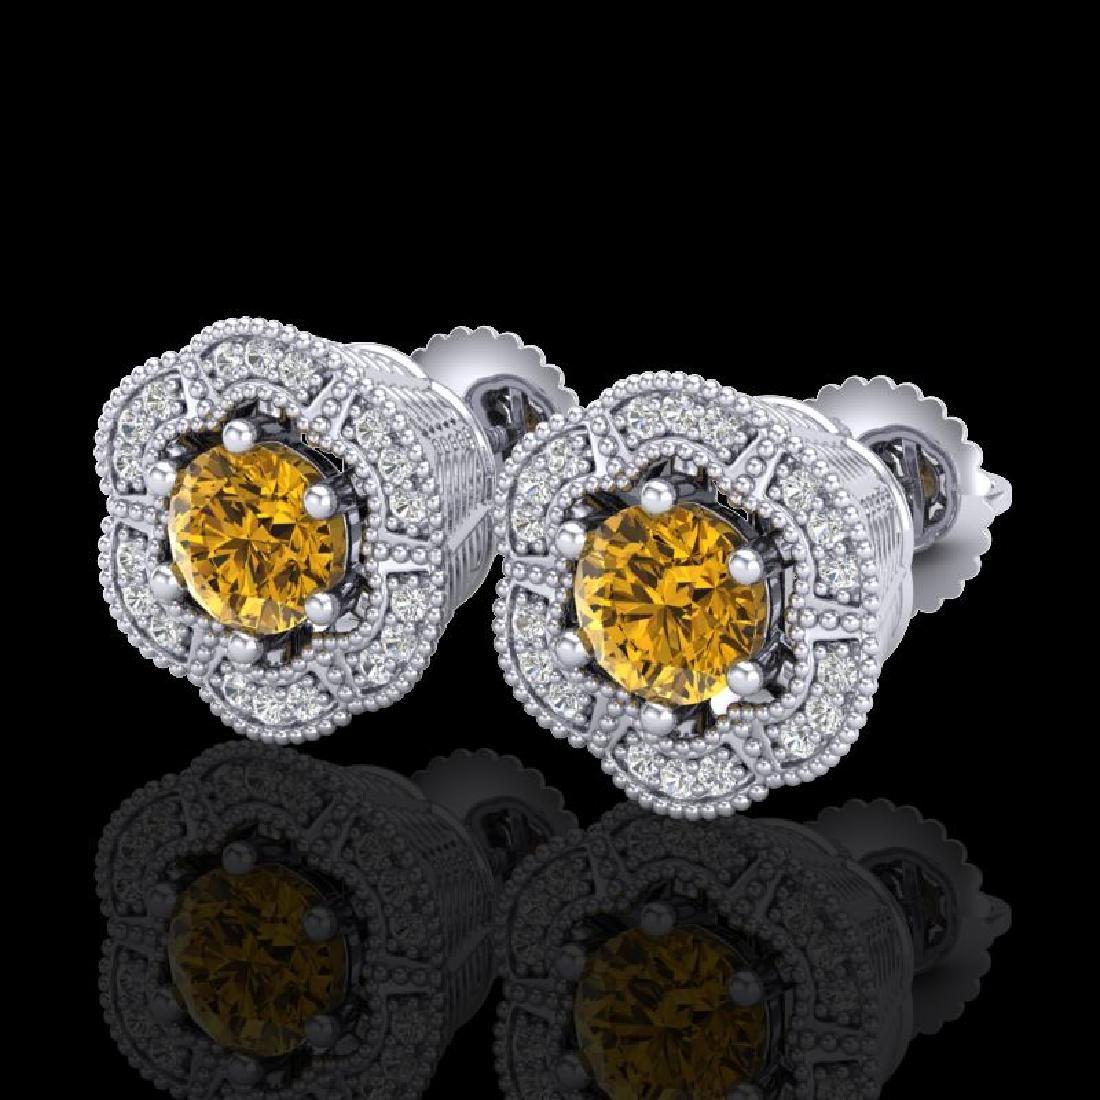 1.51 CTW Intense Fancy Yellow Diamond Art Deco Stud